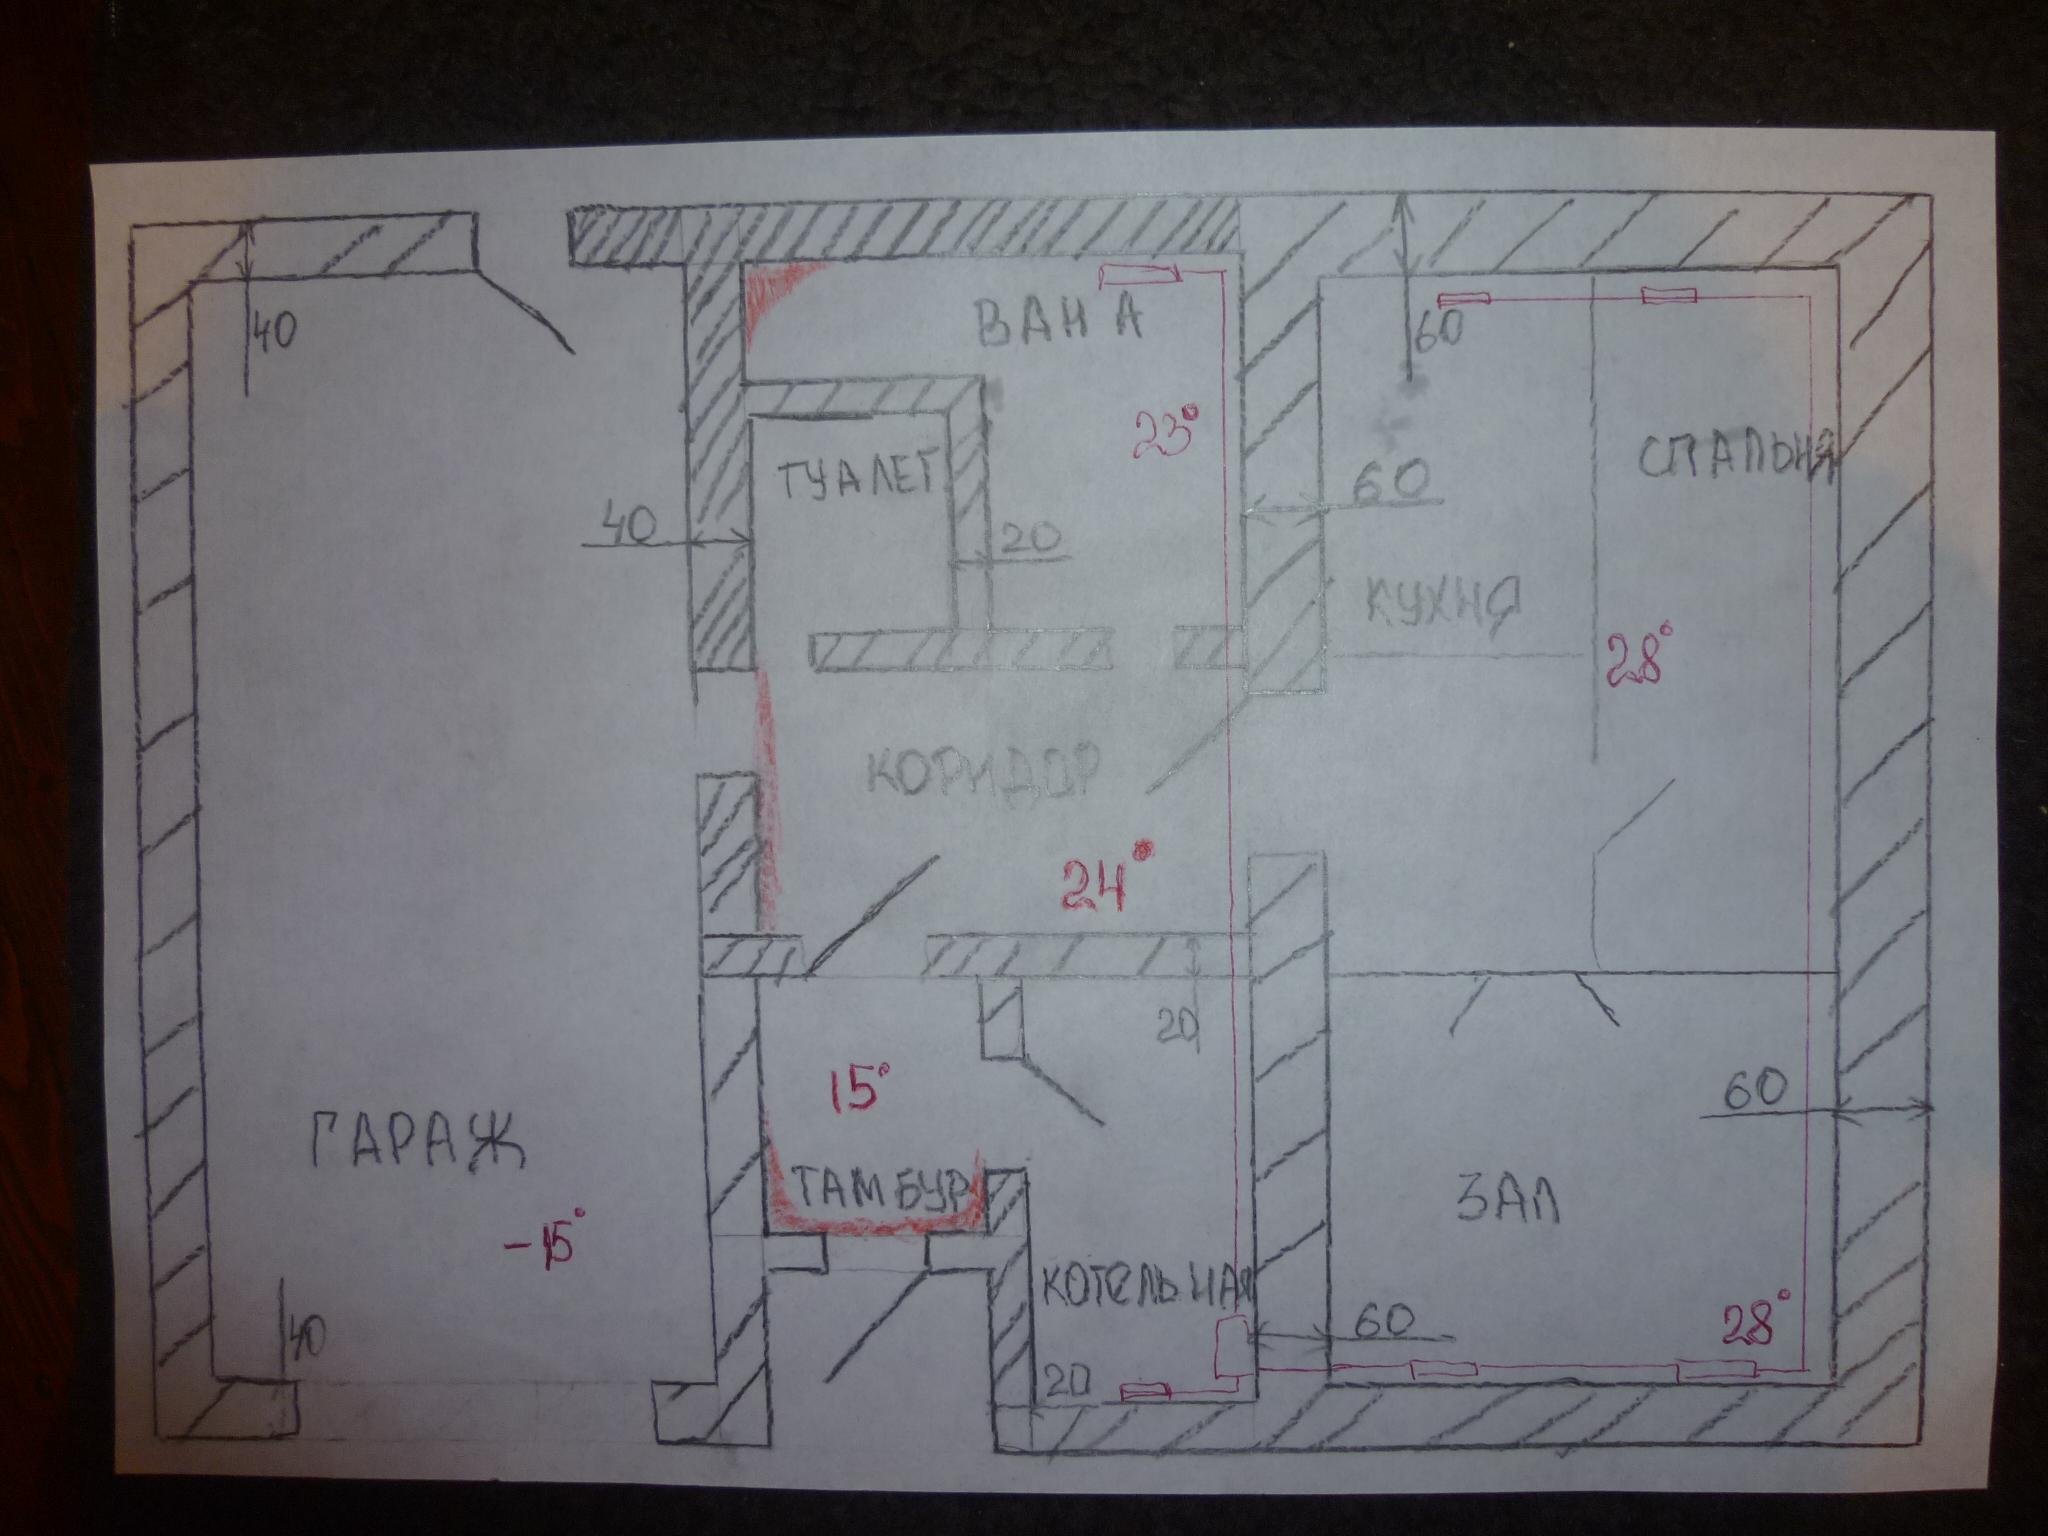 Заделка швов гипсокартона стена и потолок